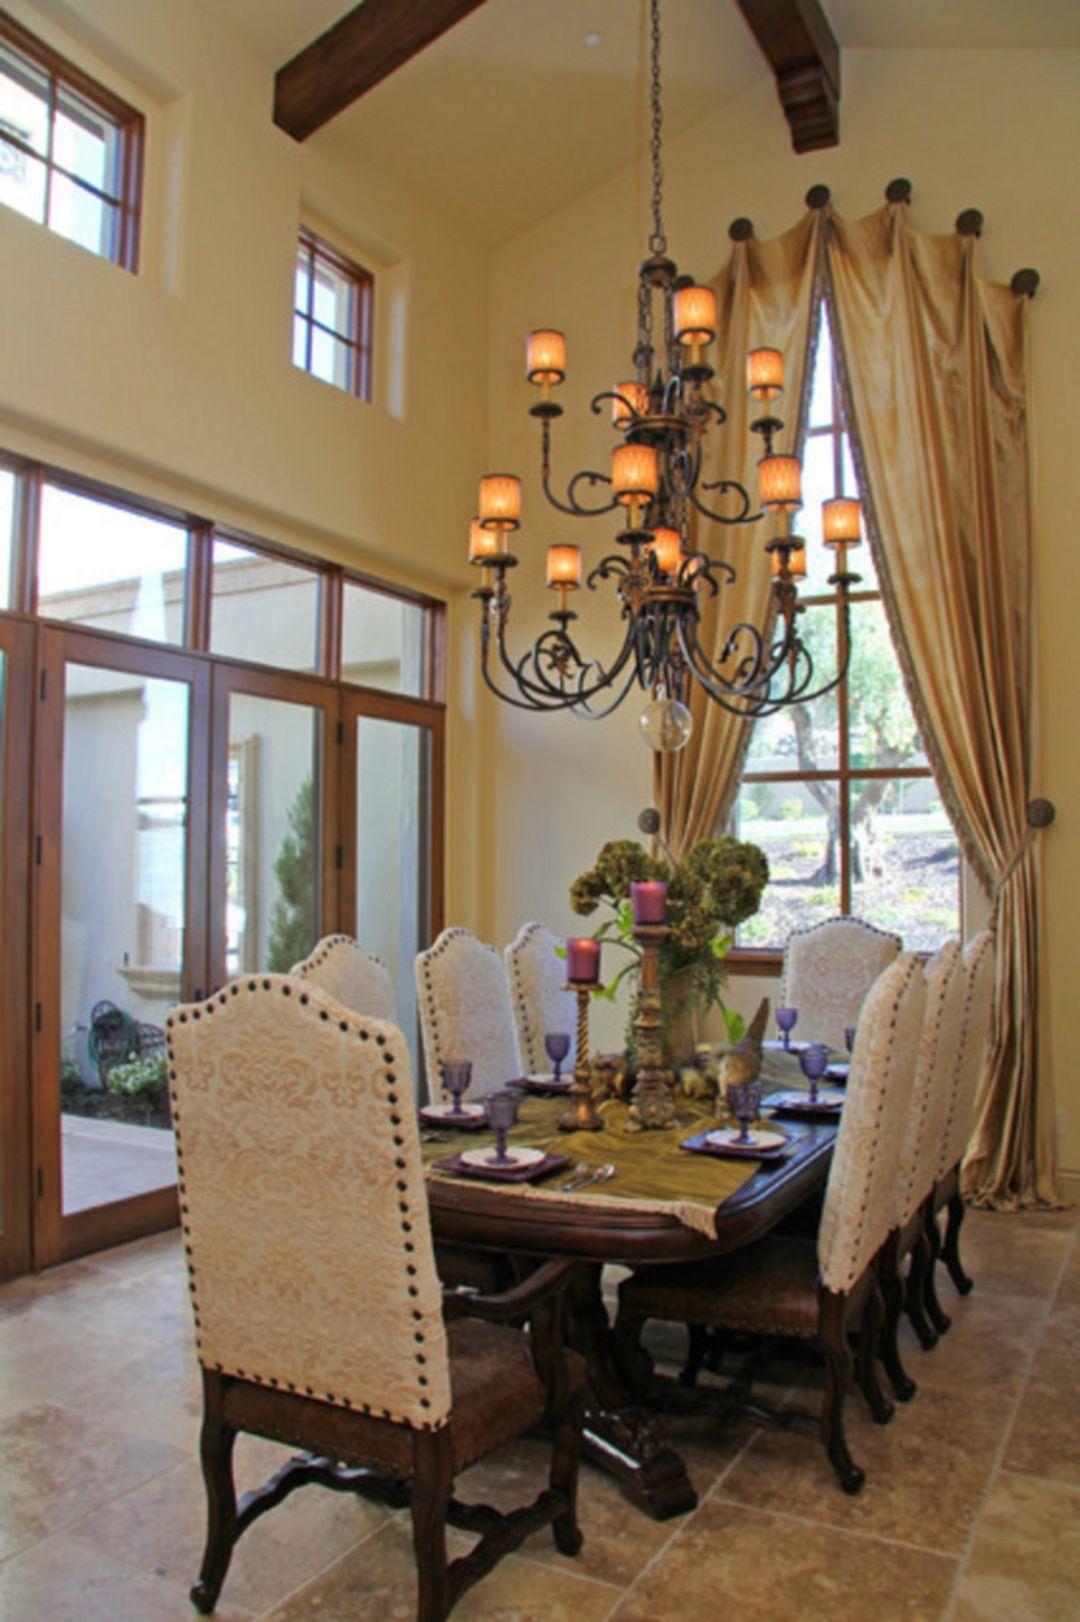 40 Mediterranean Dining Room Design Ideas For Amazing Home